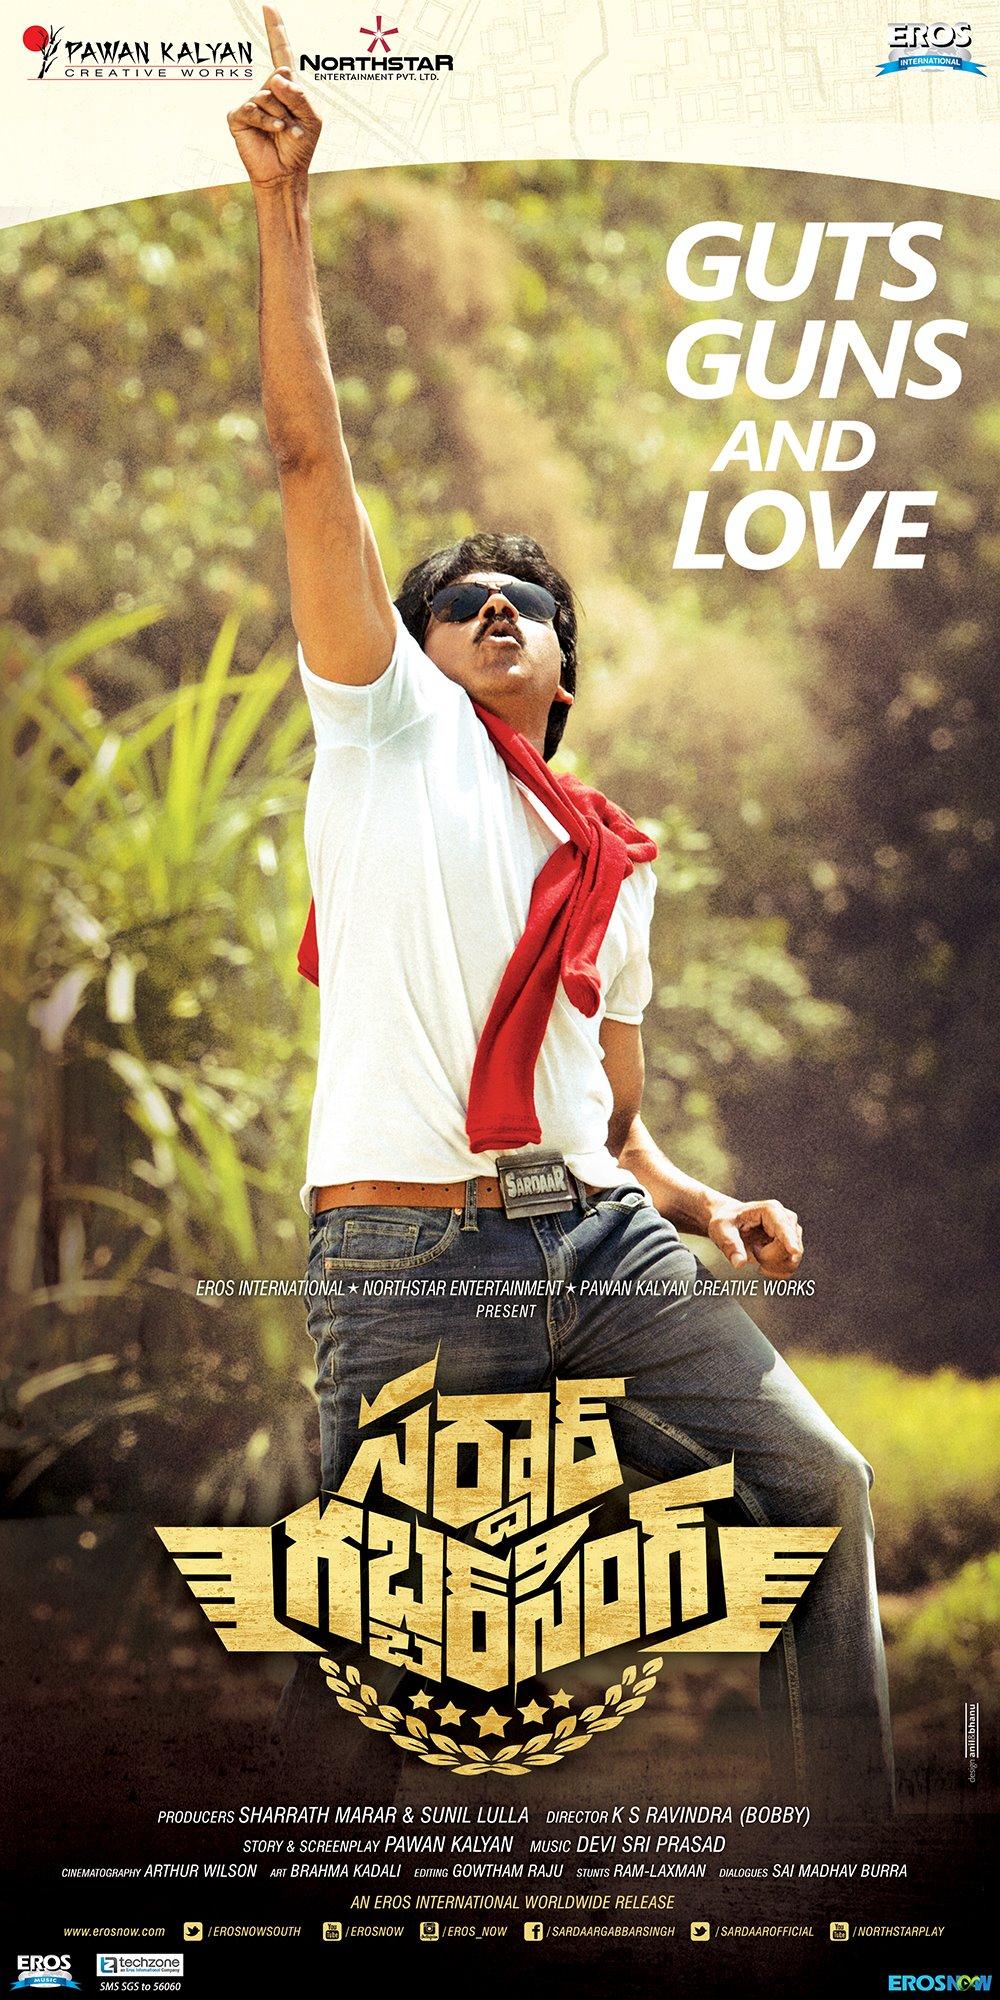 Mahesh Babu Latest Hd Wallpapers Sardar Gabbar Singh Movie Ultra Hd Posters Wallpapers